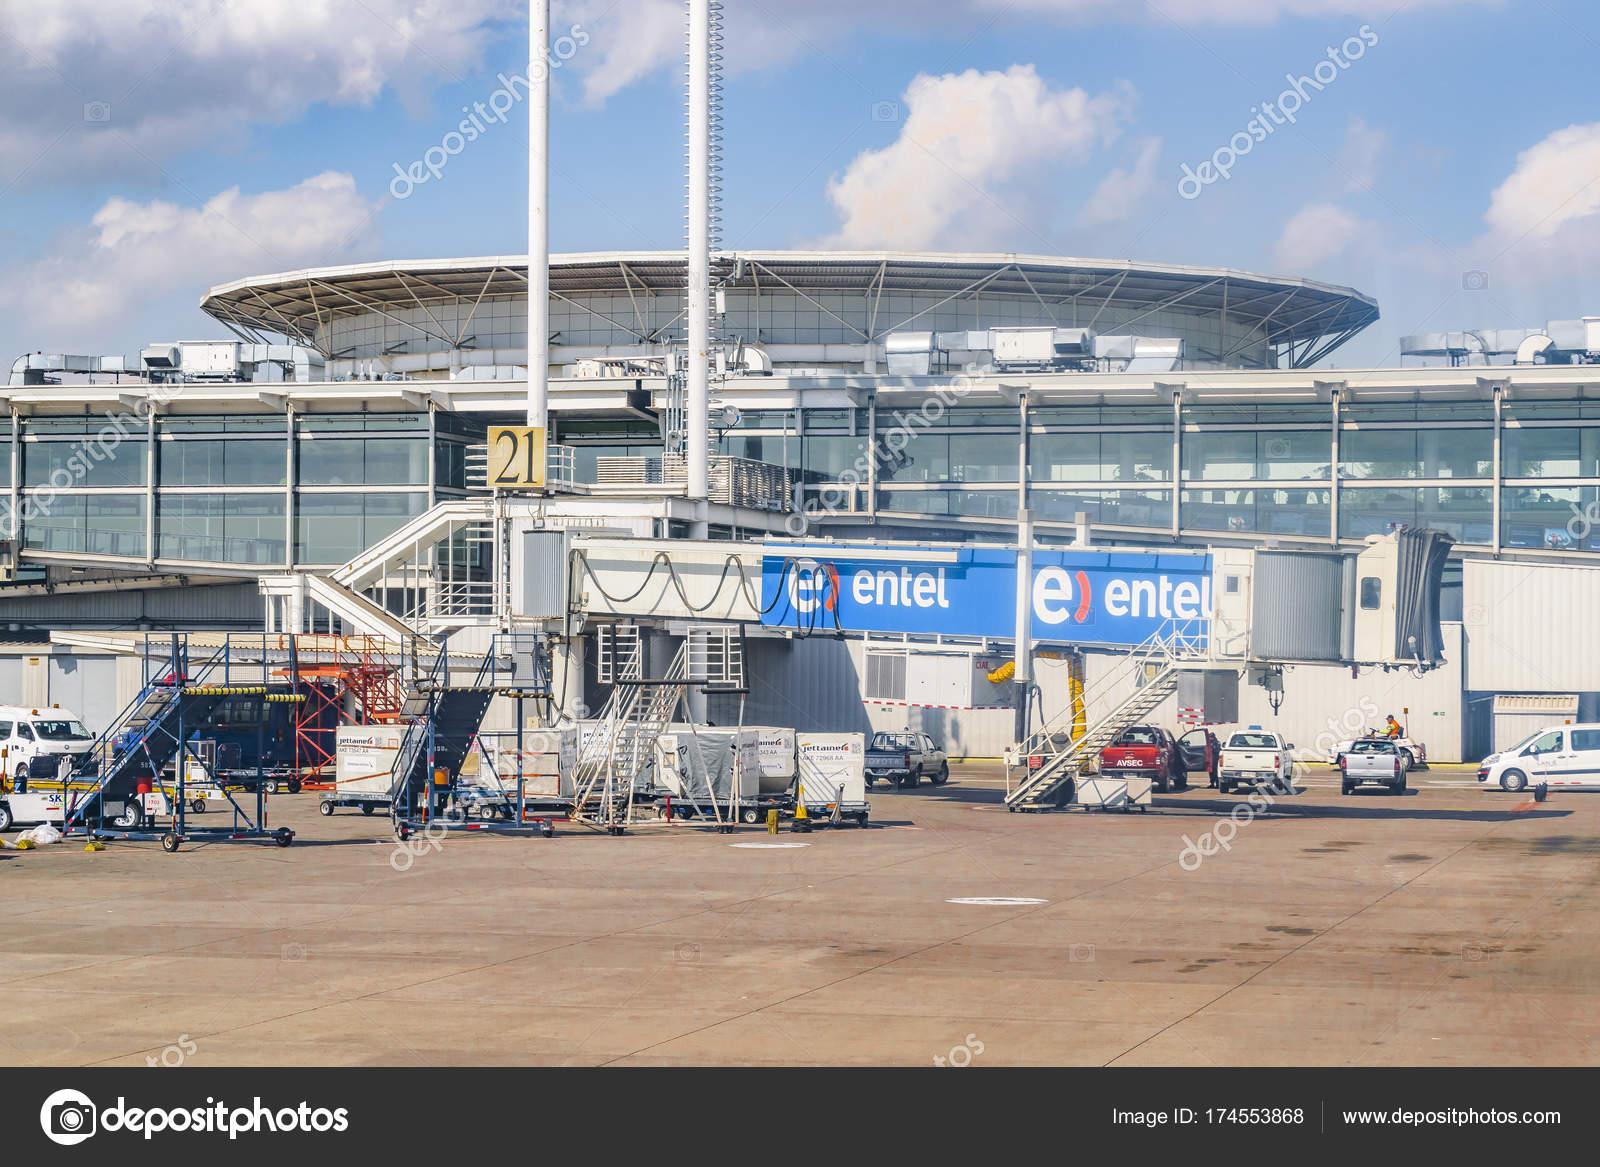 Santiago de Chile Airport, Chile – Stock Editorial Photo